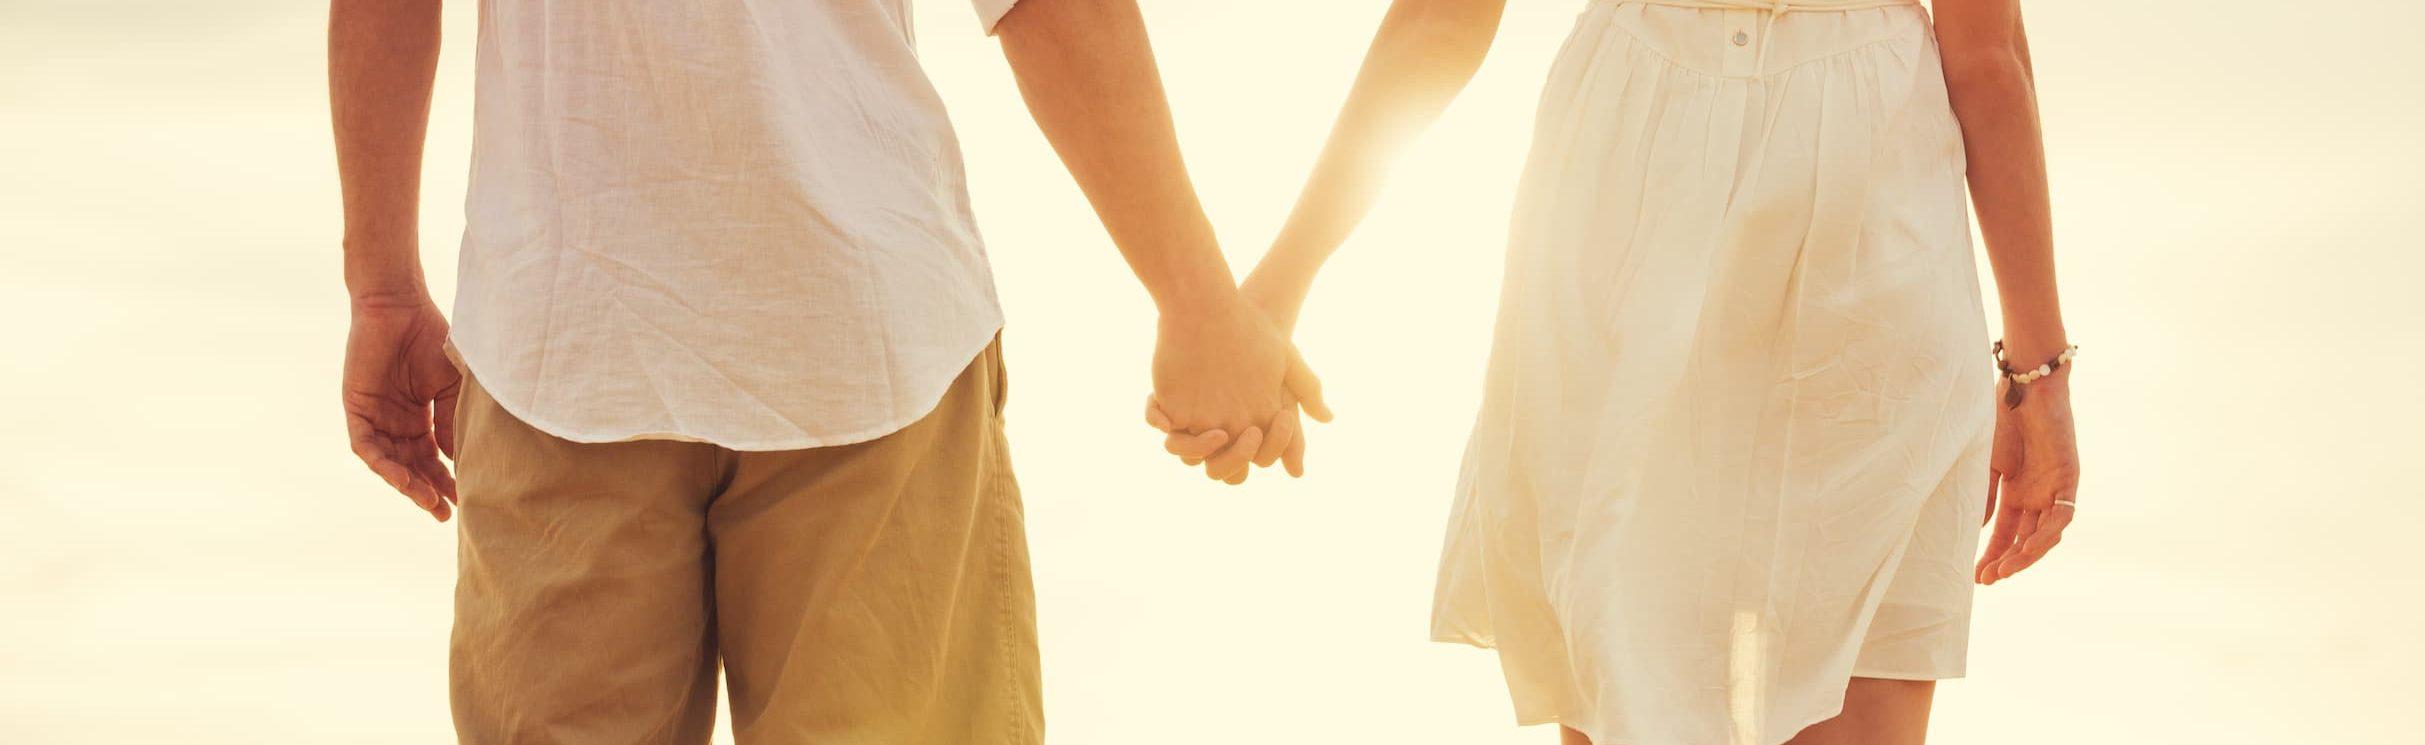 Tips For Building Healthier Relationships